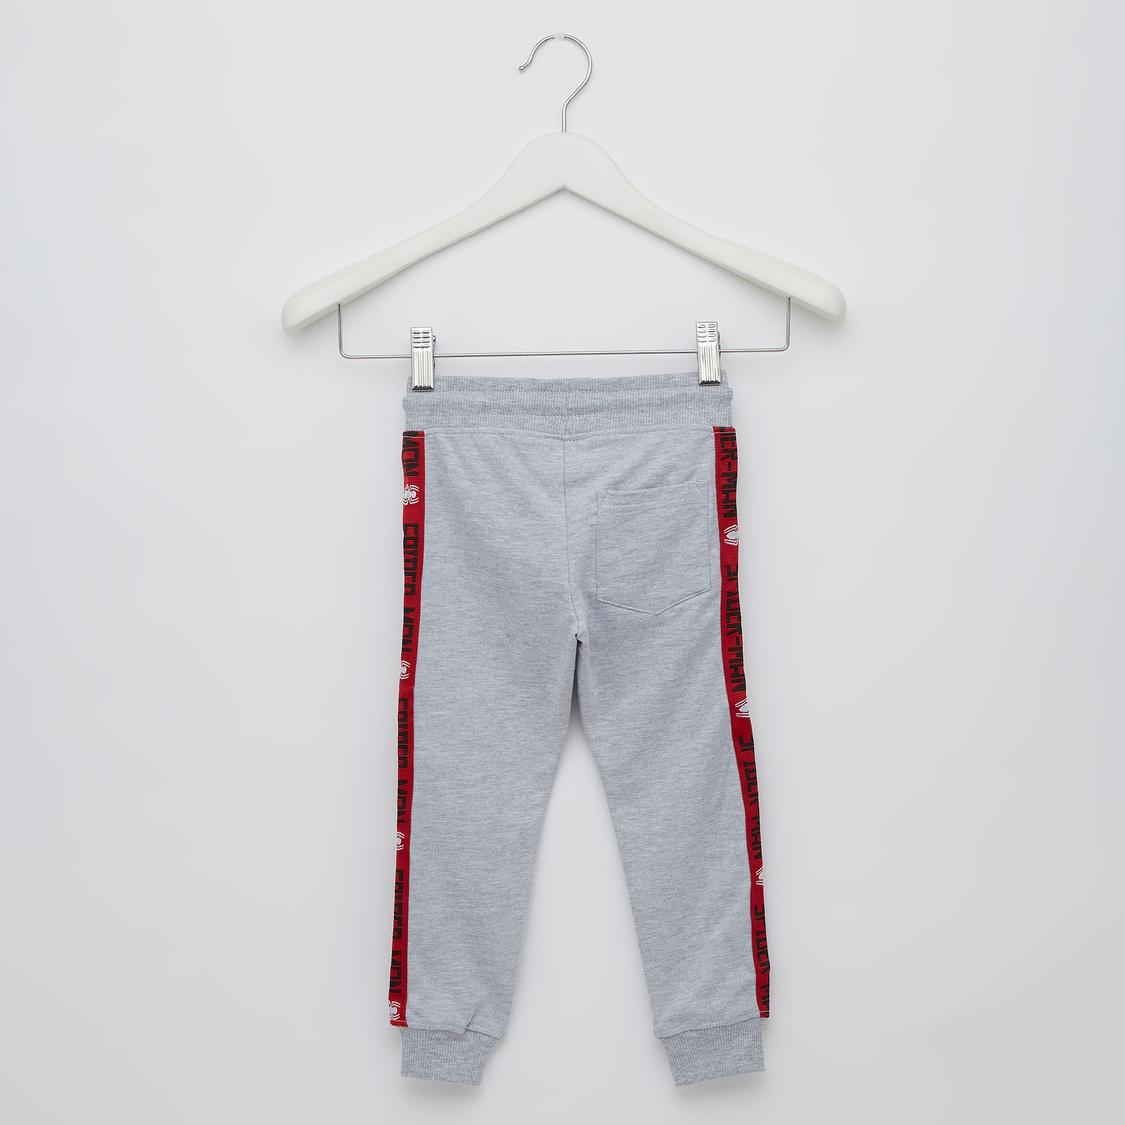 Spider Man Applique Full-Length Jog Pants with Elasticated Waist